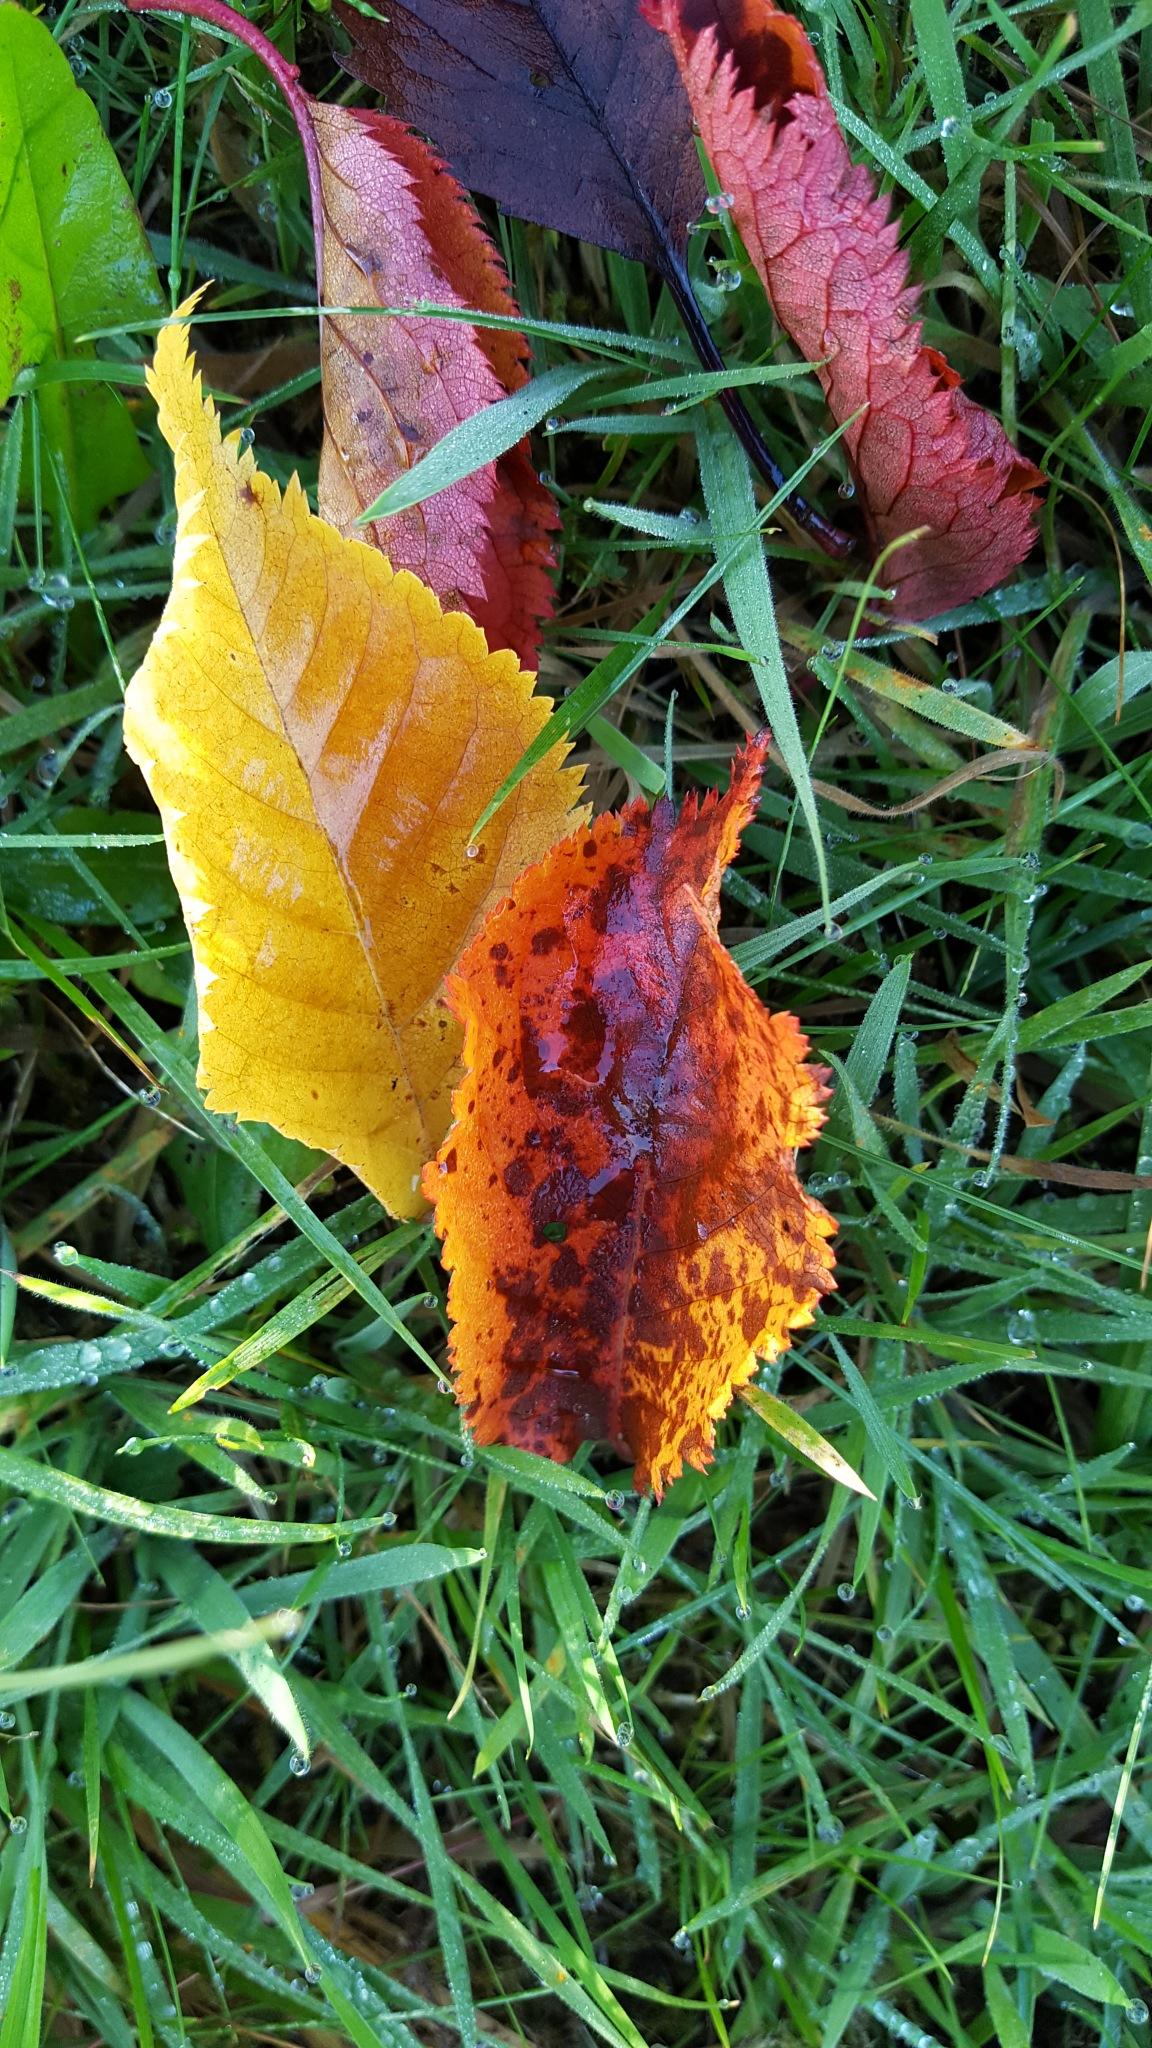 Autumn leaves by melaniehartshorn40